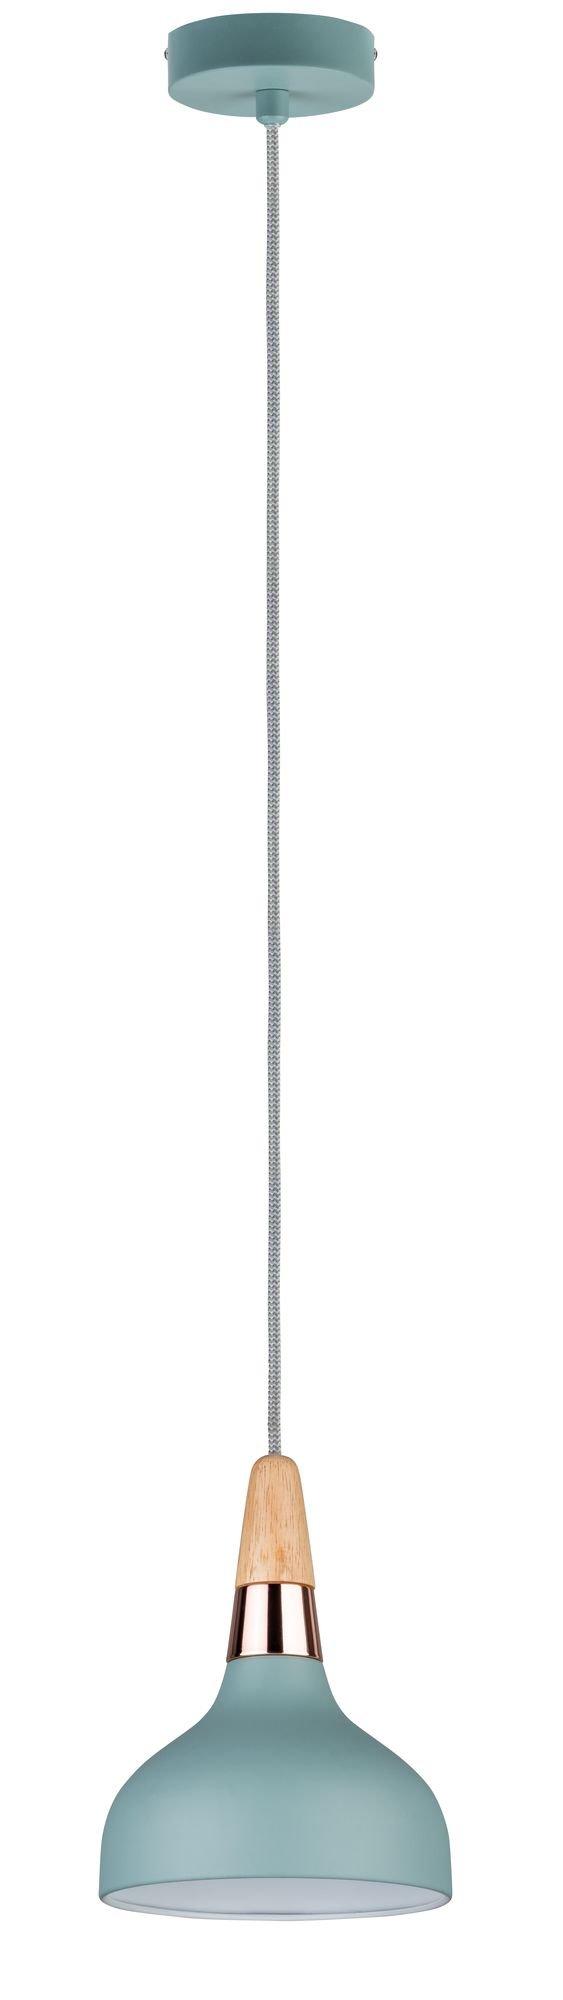 Neordic Pendelleuchte Juna E14 max. 20W Softgrün/Kupfer/Holz Metall/Holz